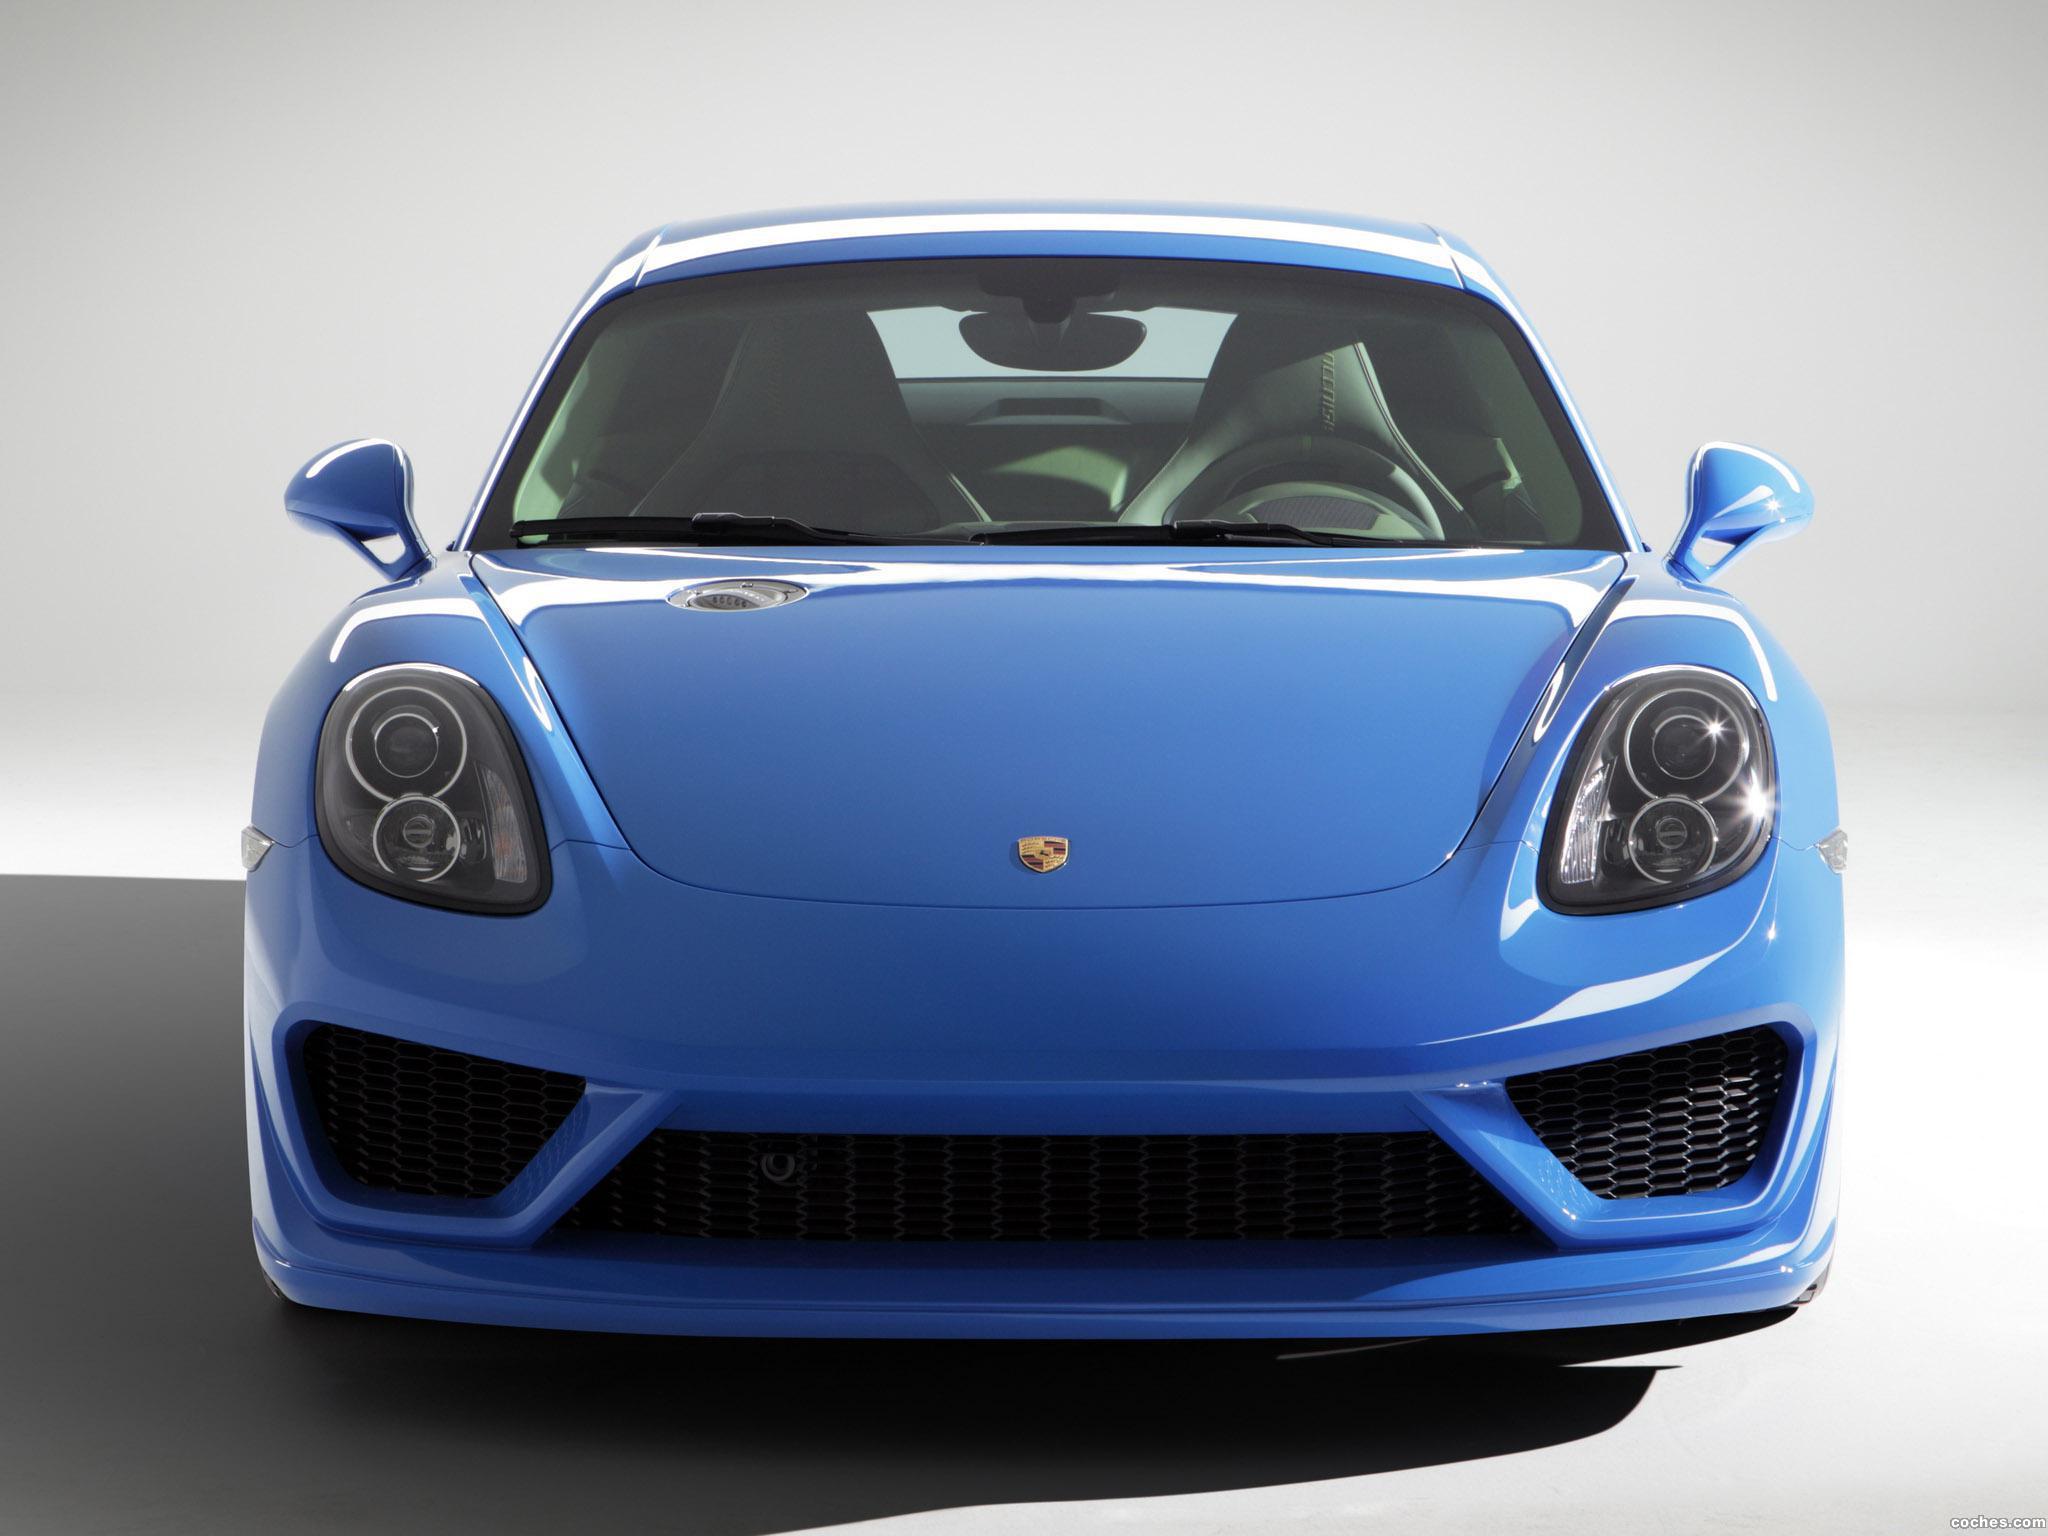 Foto 5 de Porsche Studiotorino Cayman Moncenisio 2014